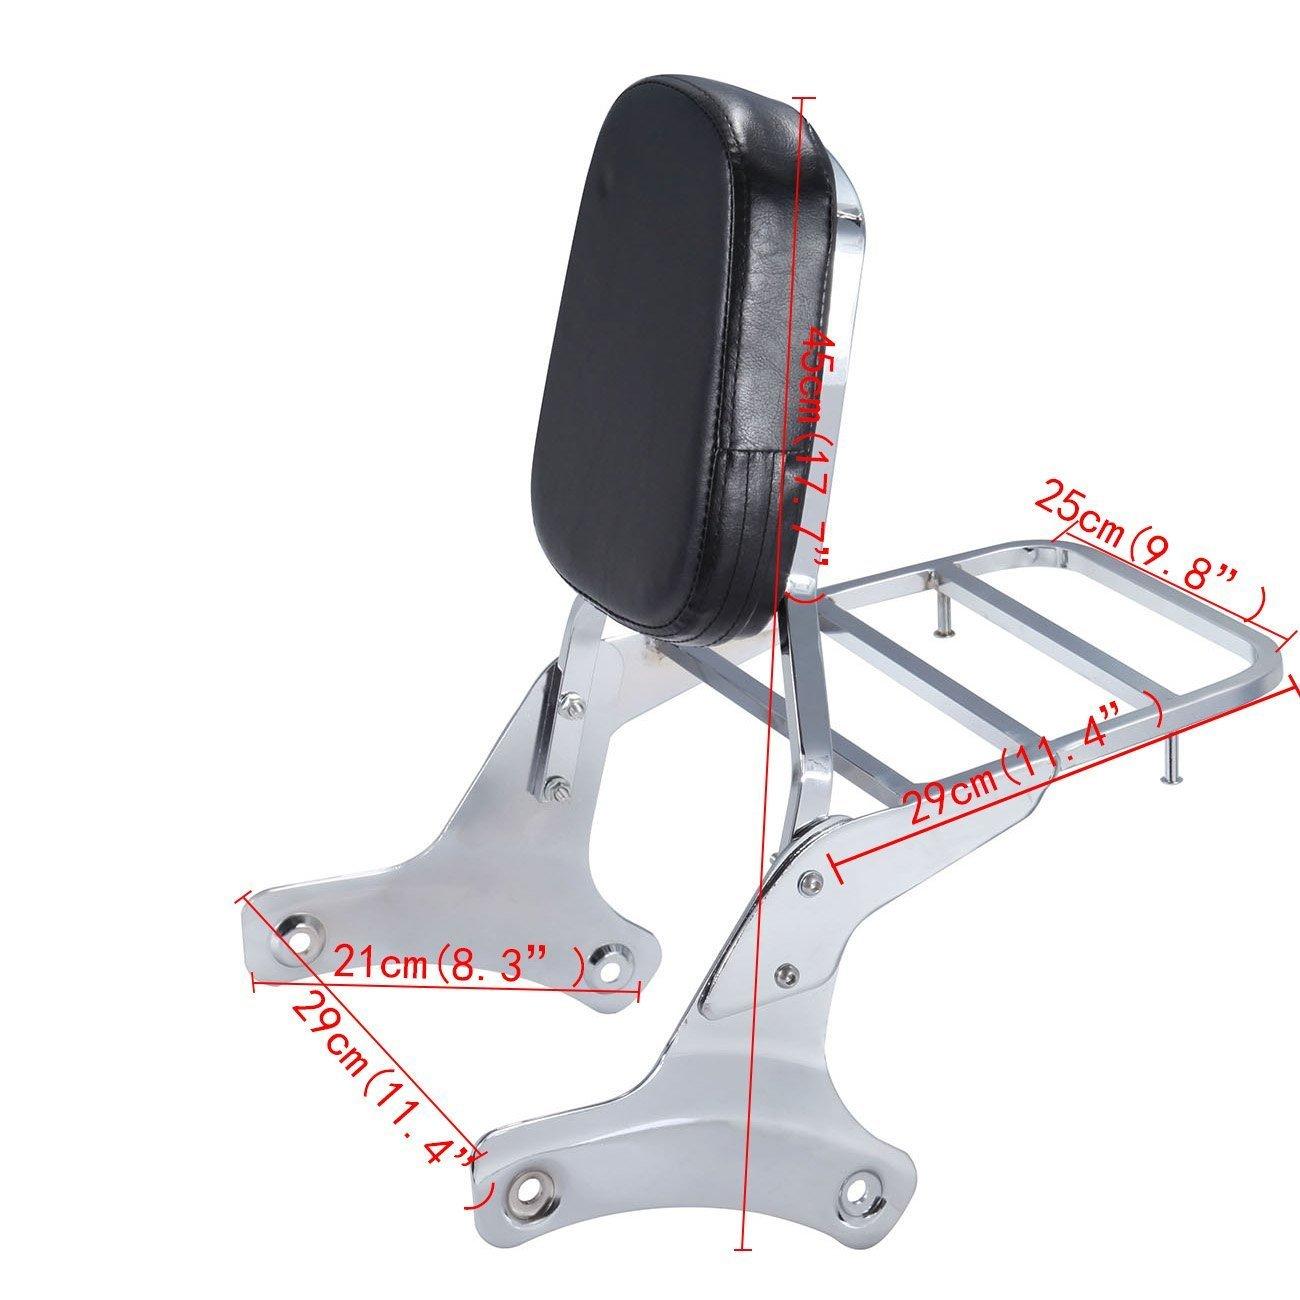 Iglobalbuy Chrome Backrest Sissy Bar Luggage Rack for Honda Shadow VT750 C2 RC44 1998-2003 VT 400 1997-2003